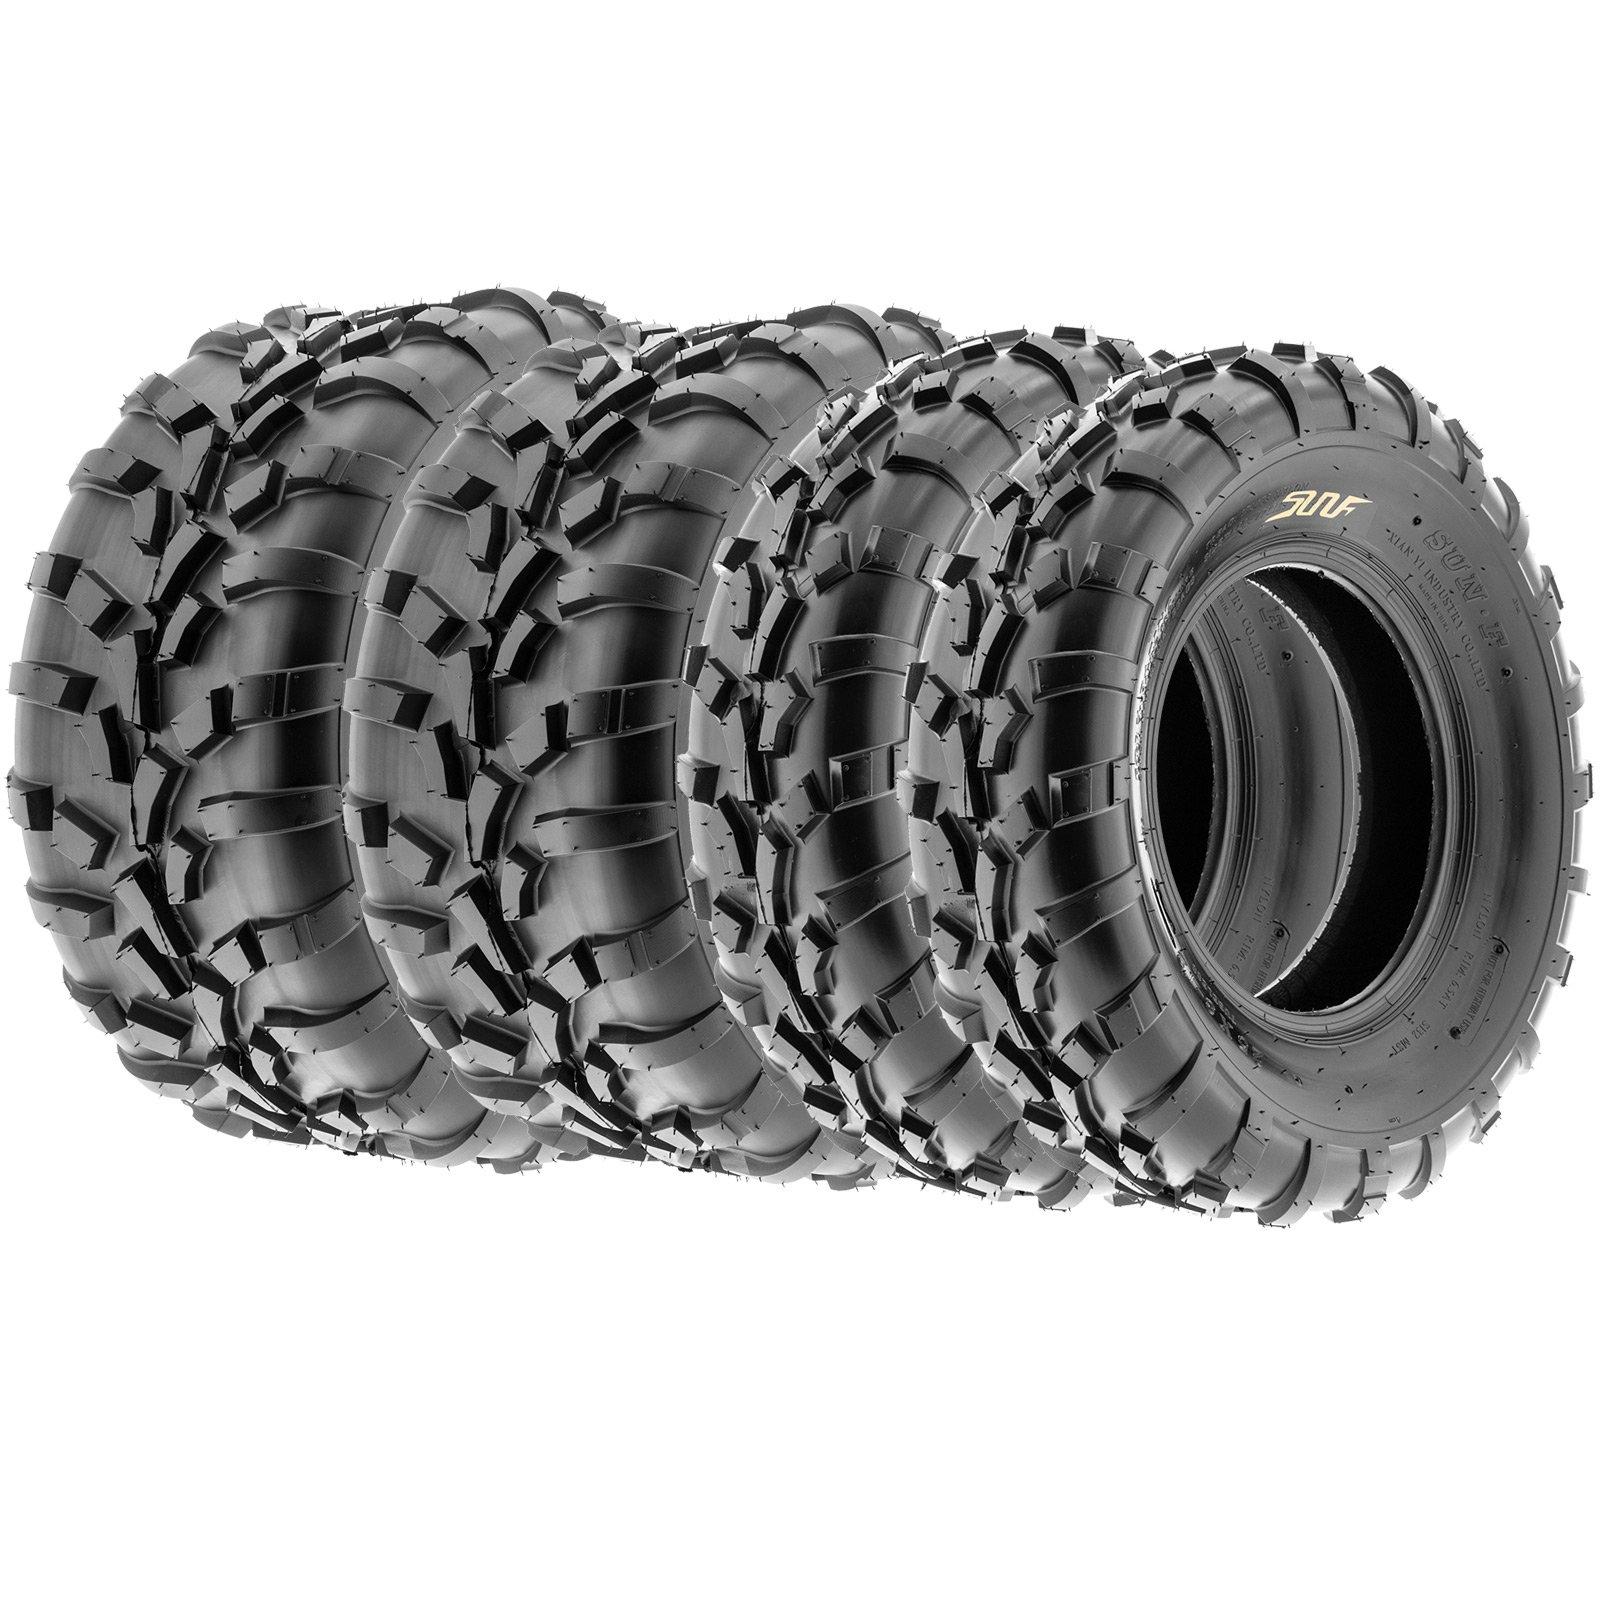 SunF Sport A/T UTV ATV Tires 25x8-12 & 25x11-12 6 PR A010 (Full set of 4) by SunF